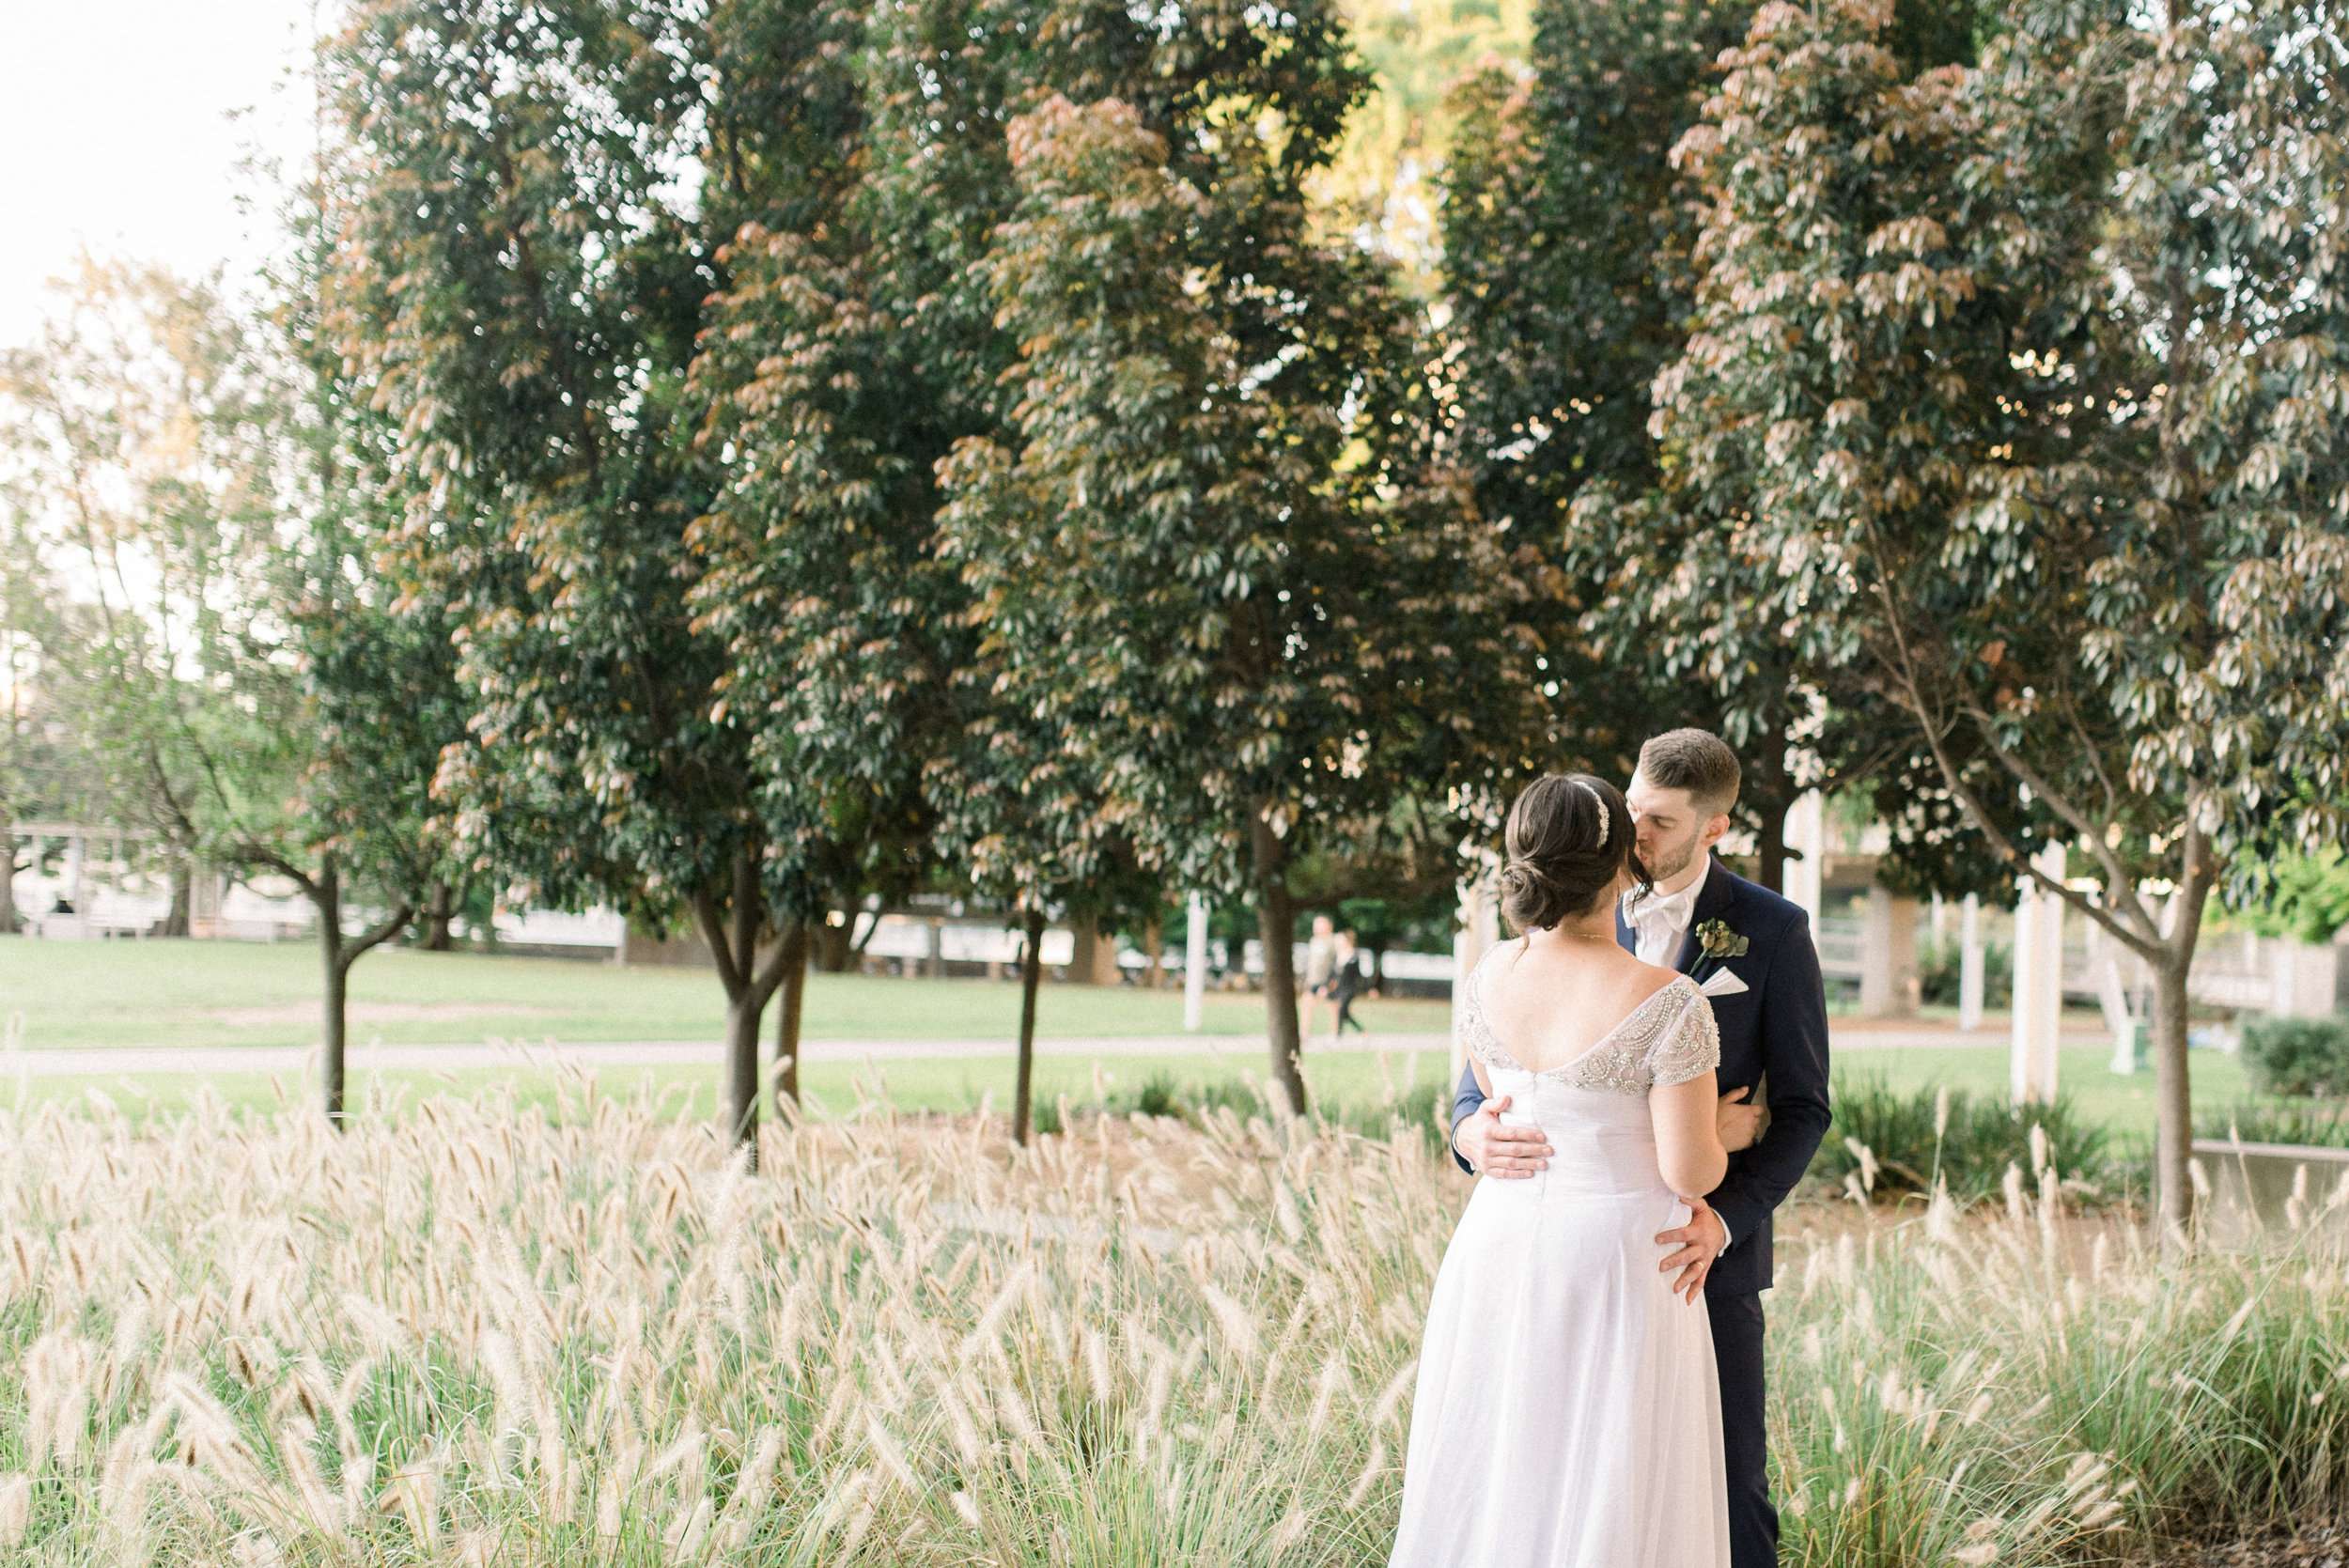 brisbane-city-wedding-photography-film-light-loft-westend-1-23.jpg